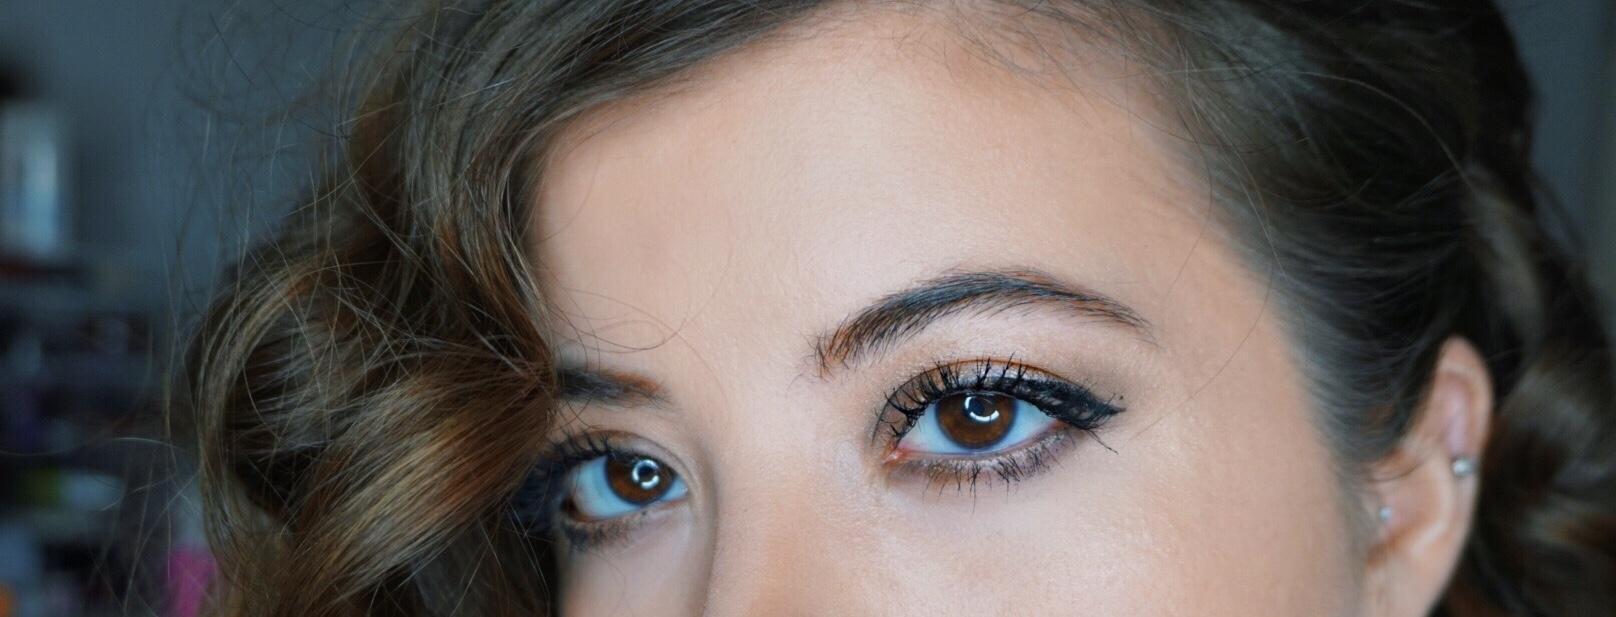 Milani - Soft & Sultry Eyeshadow Palette - Halo Eye